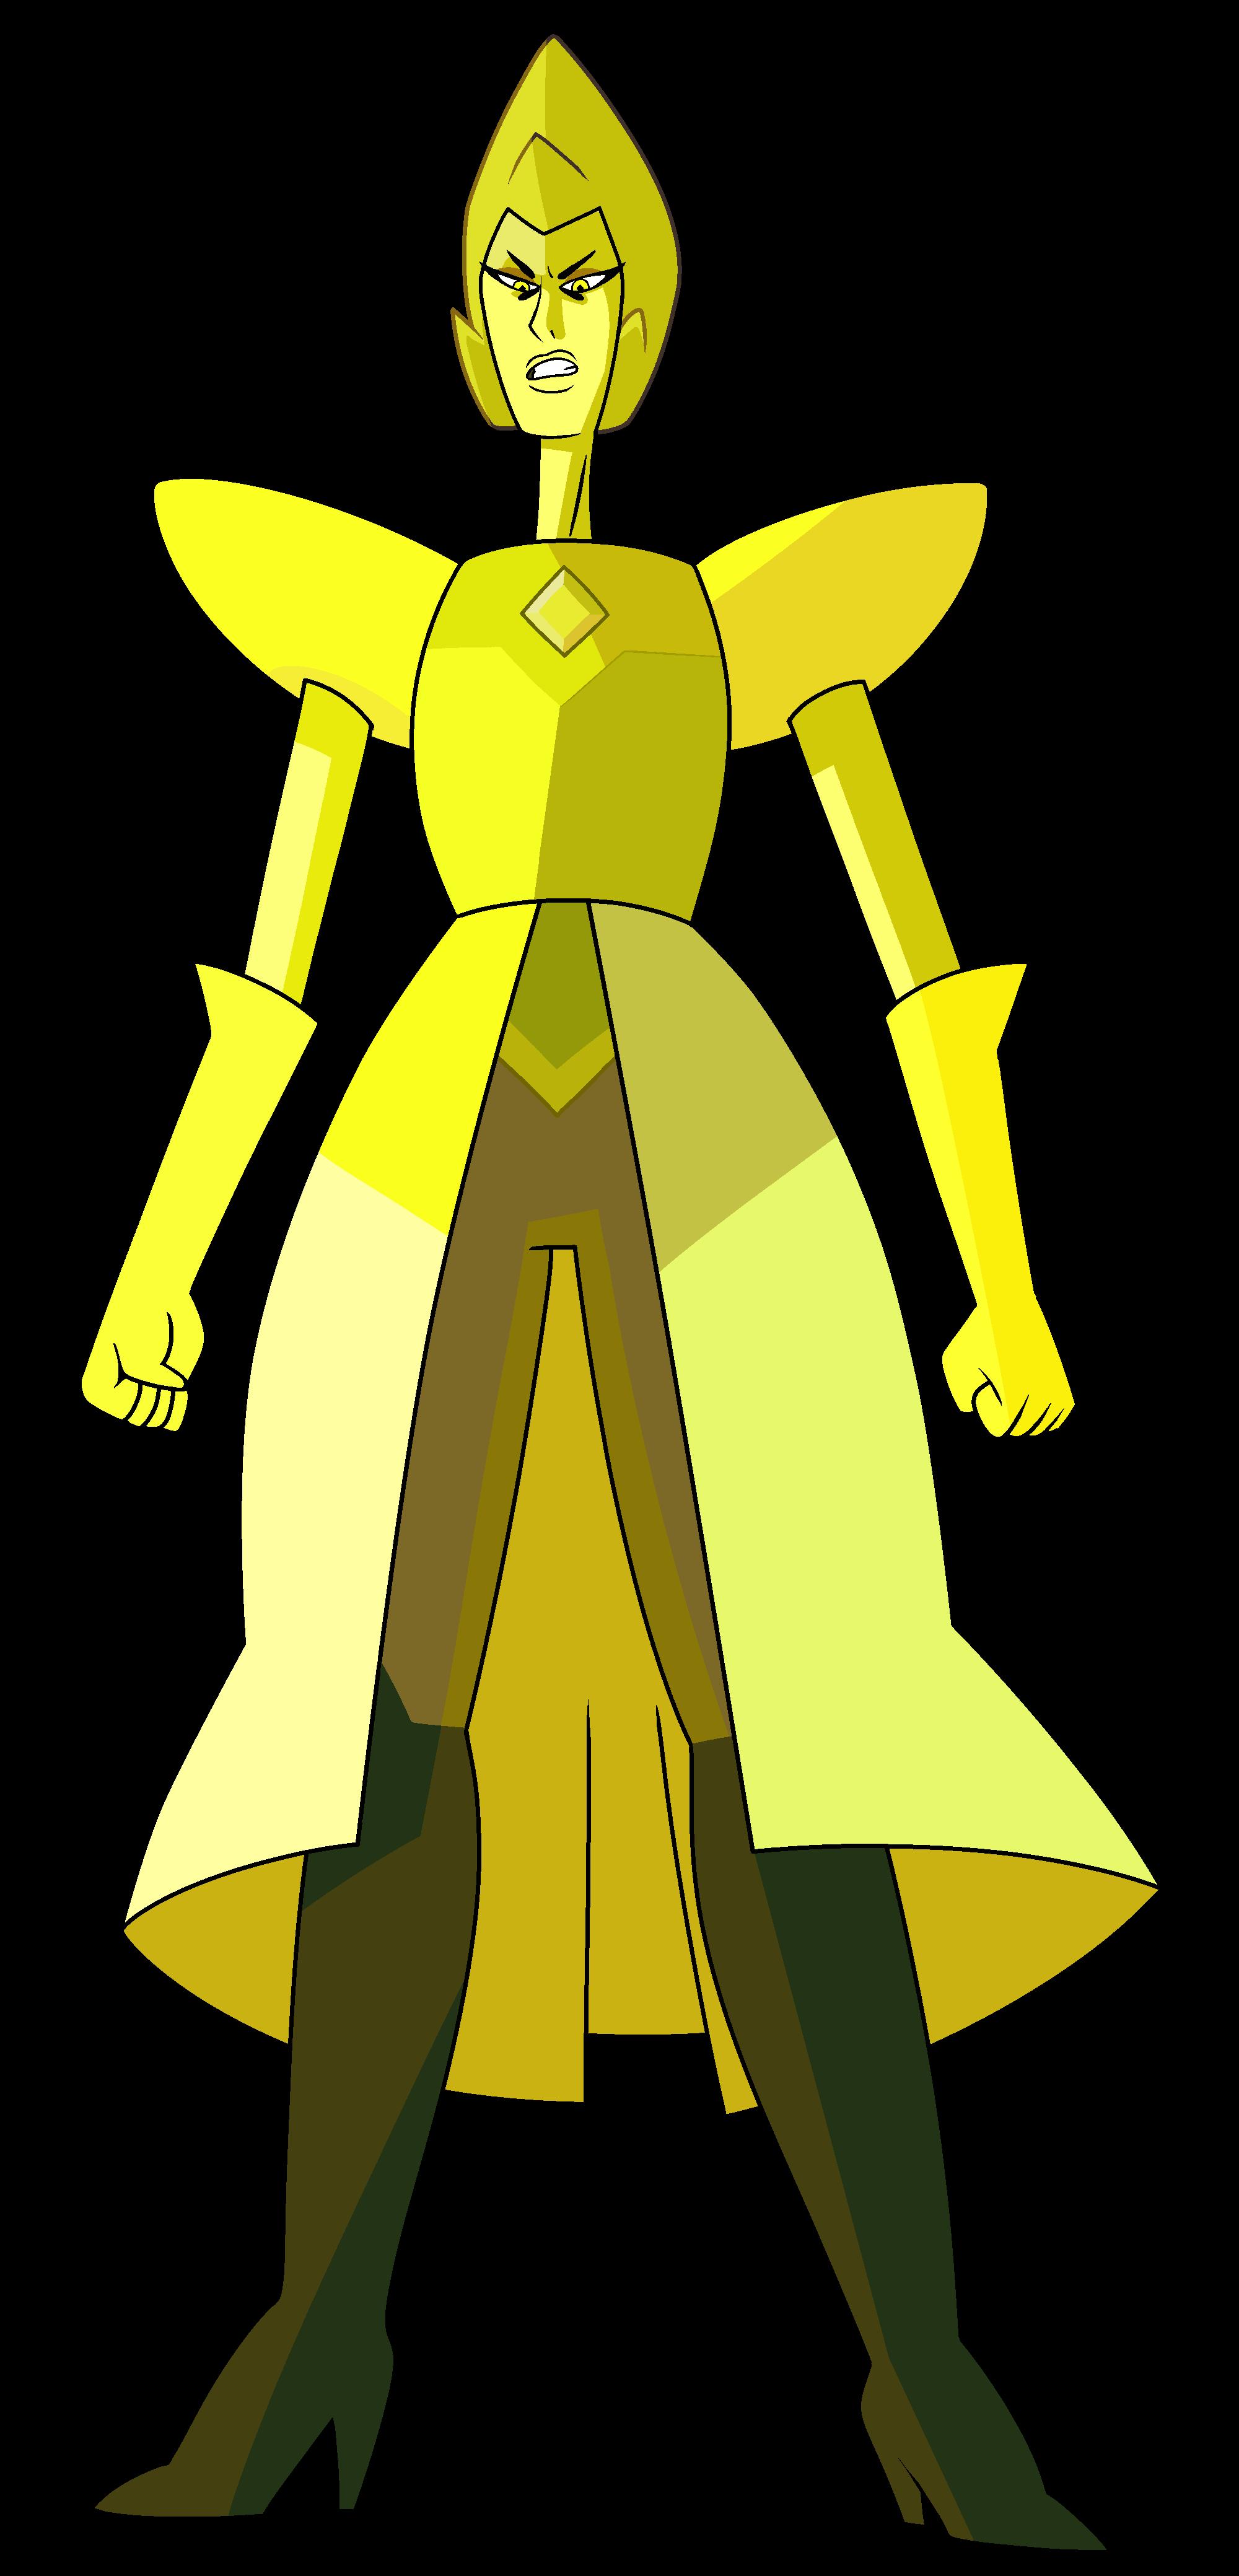 Clipart diamond shiny diamond. Yellow knd the gamewizard